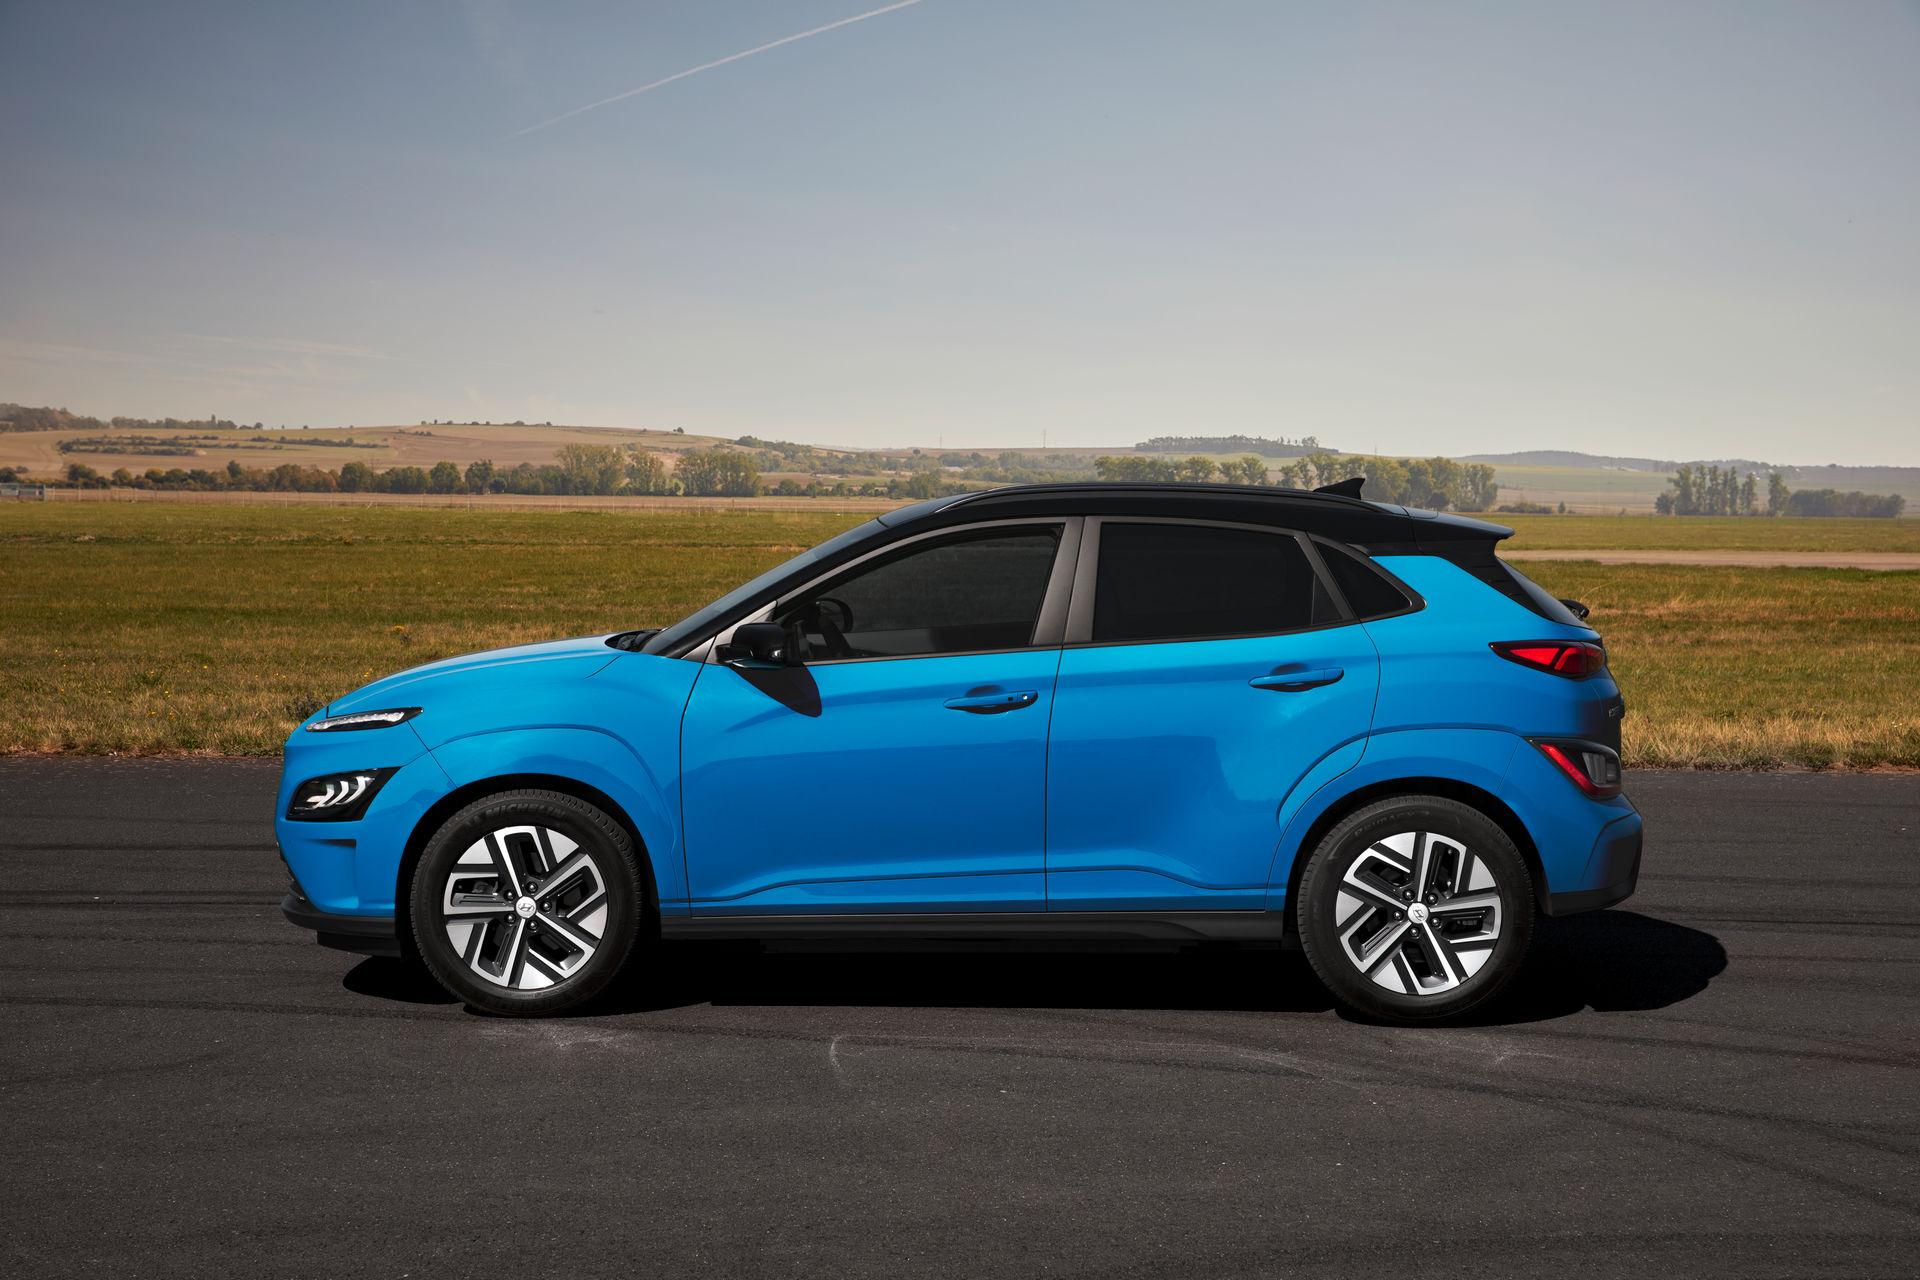 электромобиль Hyundai Kona Electric 2021 сбоку